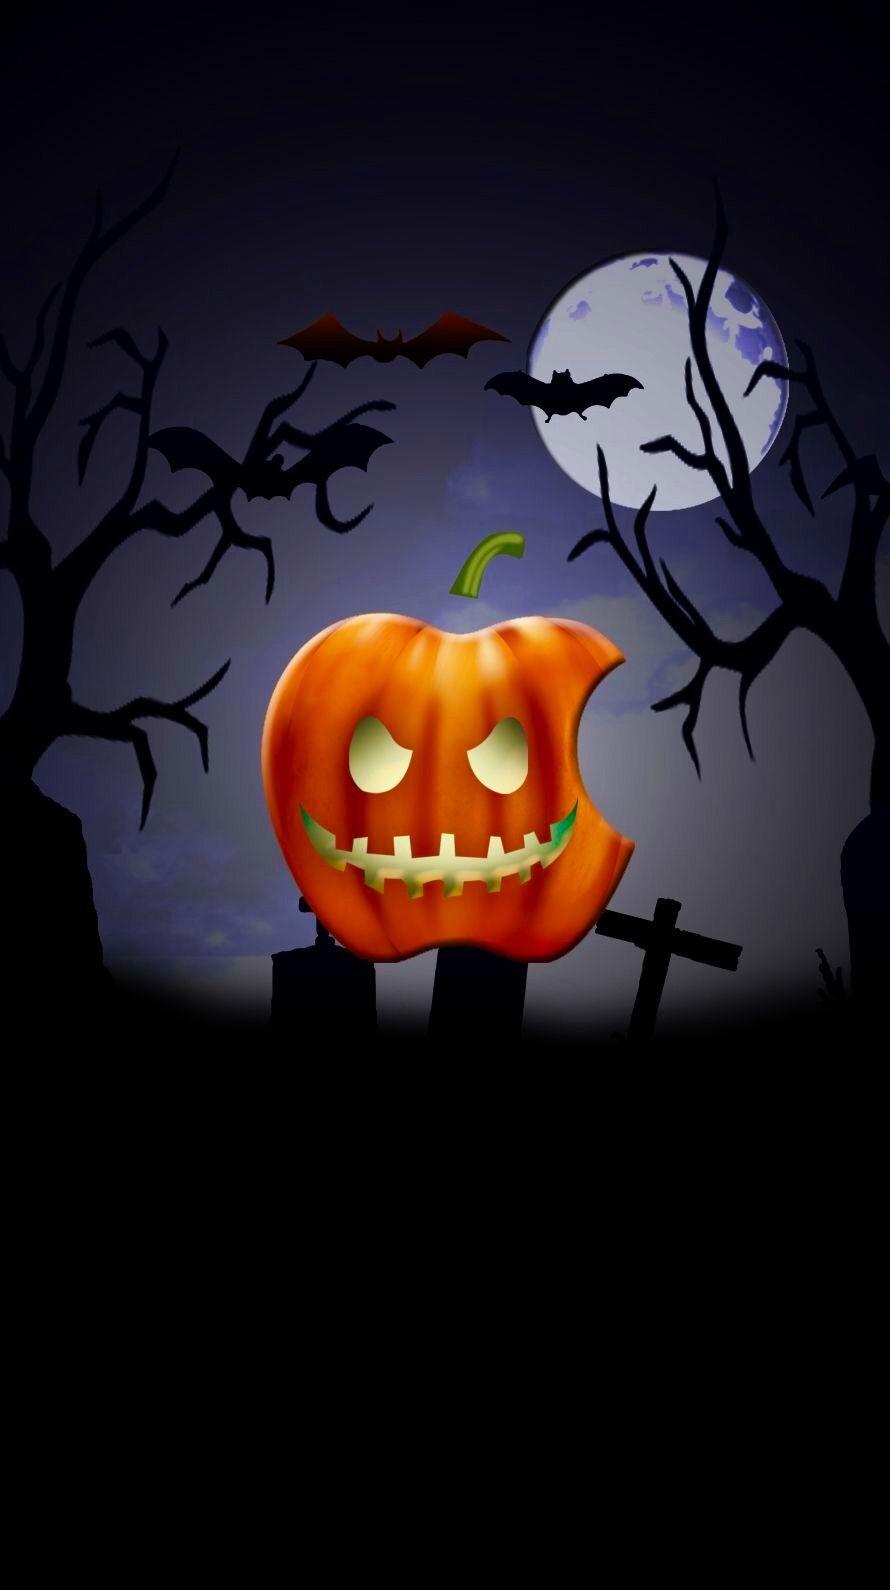 Jack O Lantern Apple Halloween Wallpaper Apple Logo Wallpaper Apple Wallpaper